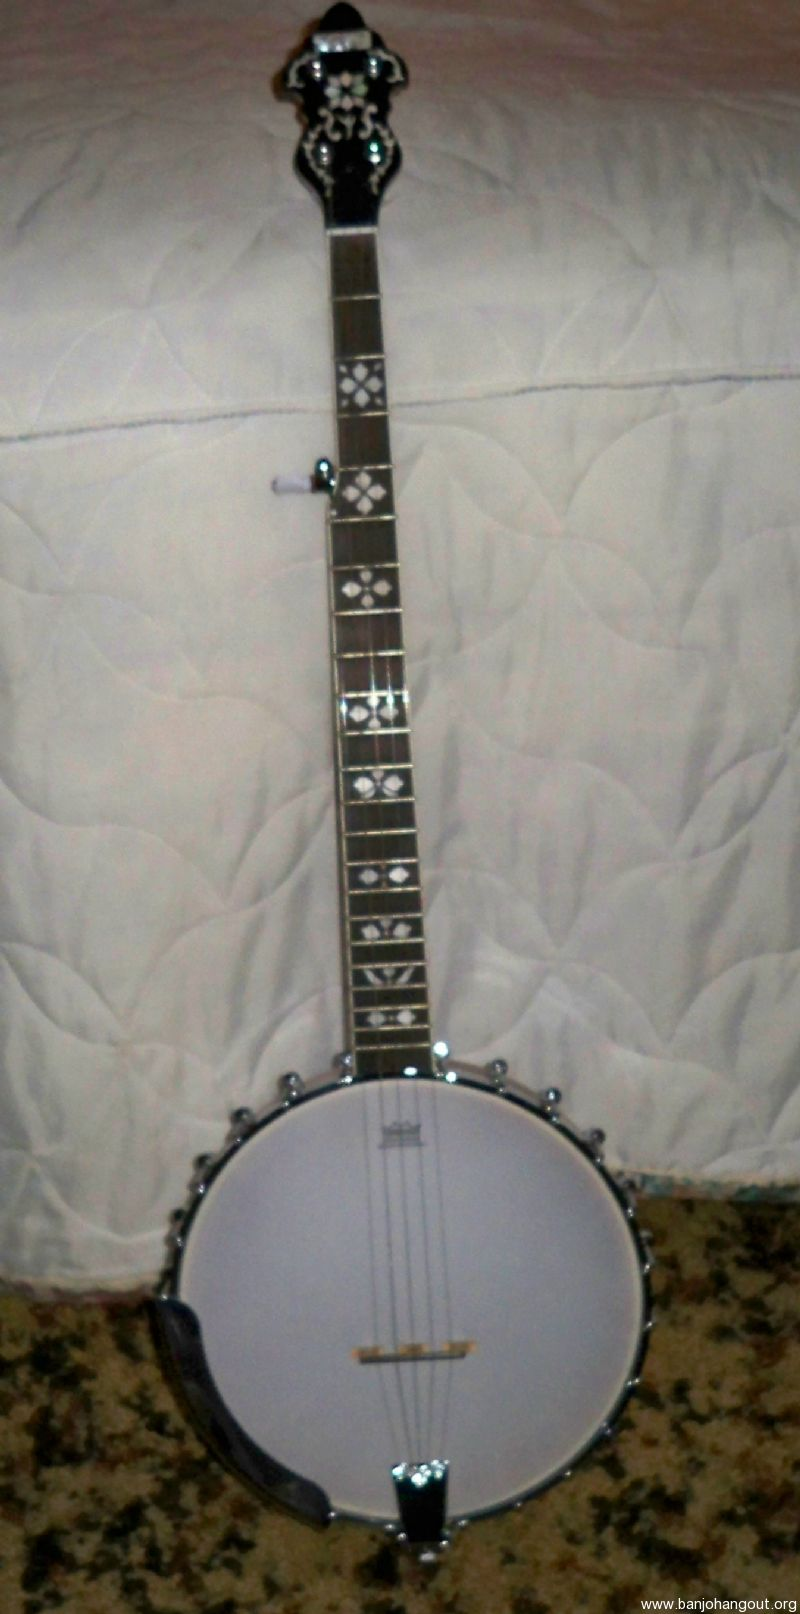 New Recording King open back banjo Sale Pending - Used Banjo For